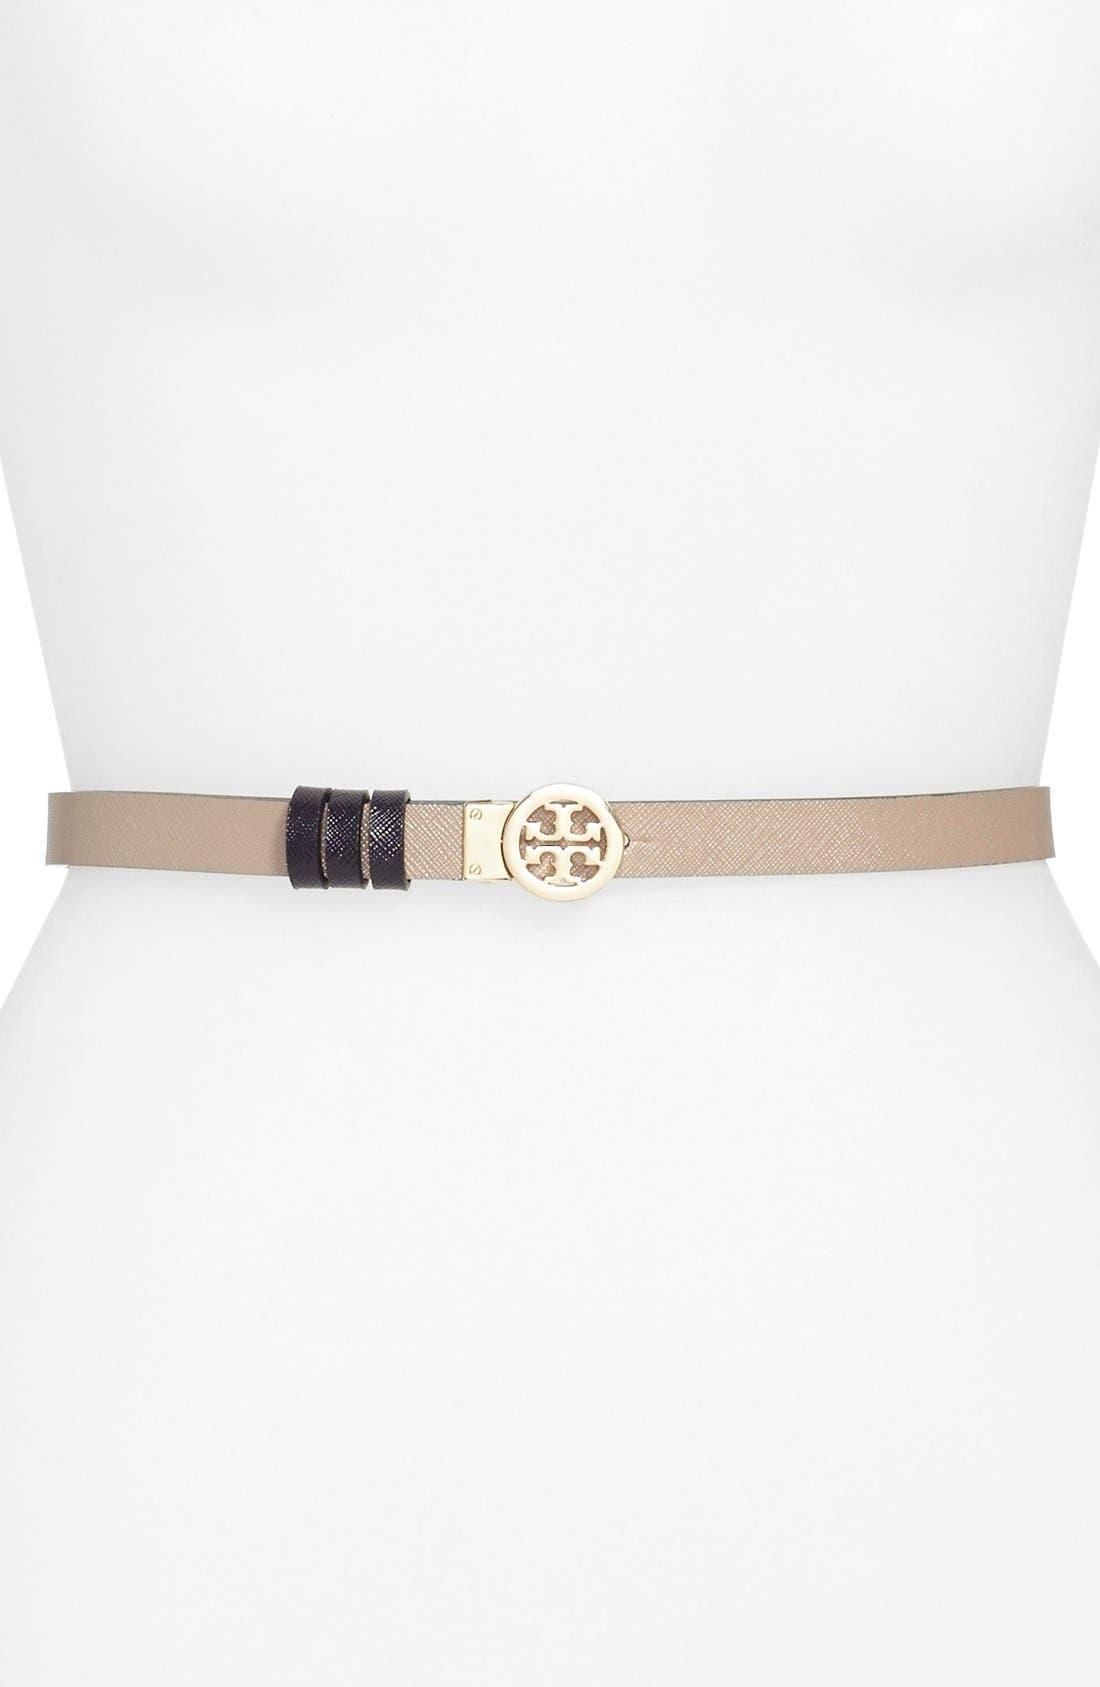 TORY BURCH Rotating Logo Skinny Leather Belt, Main, color, 024